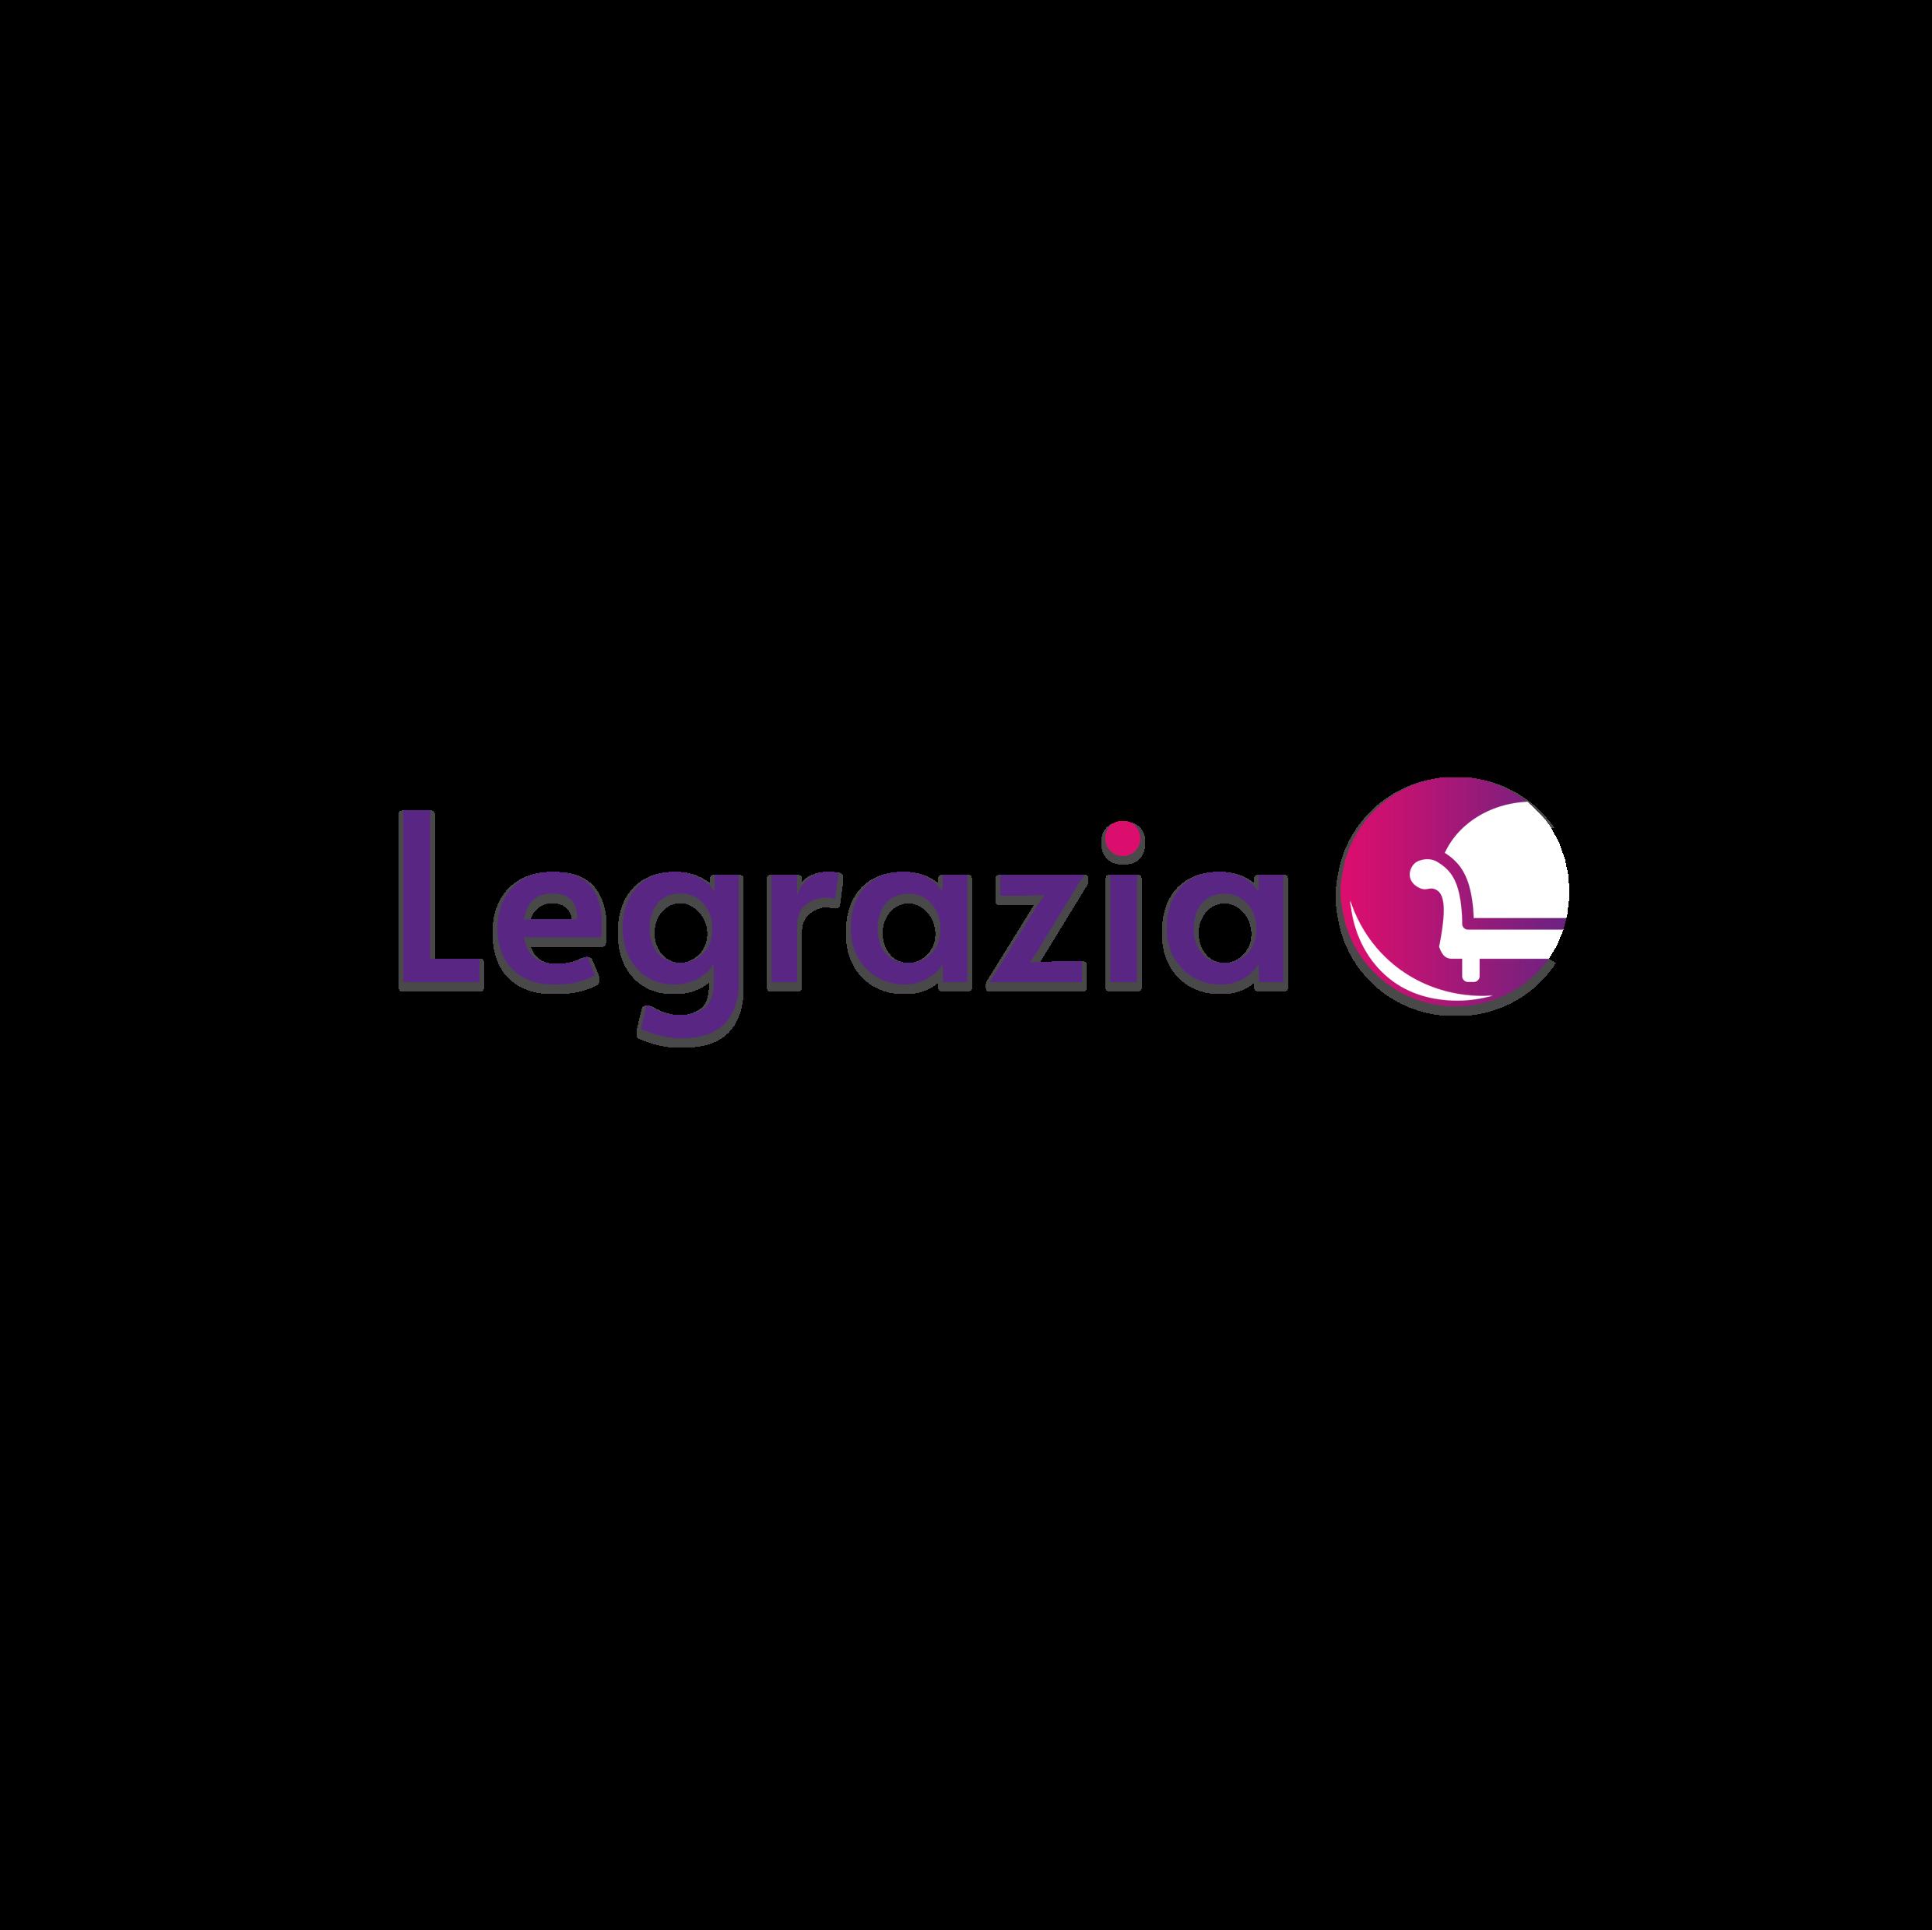 Legrazia